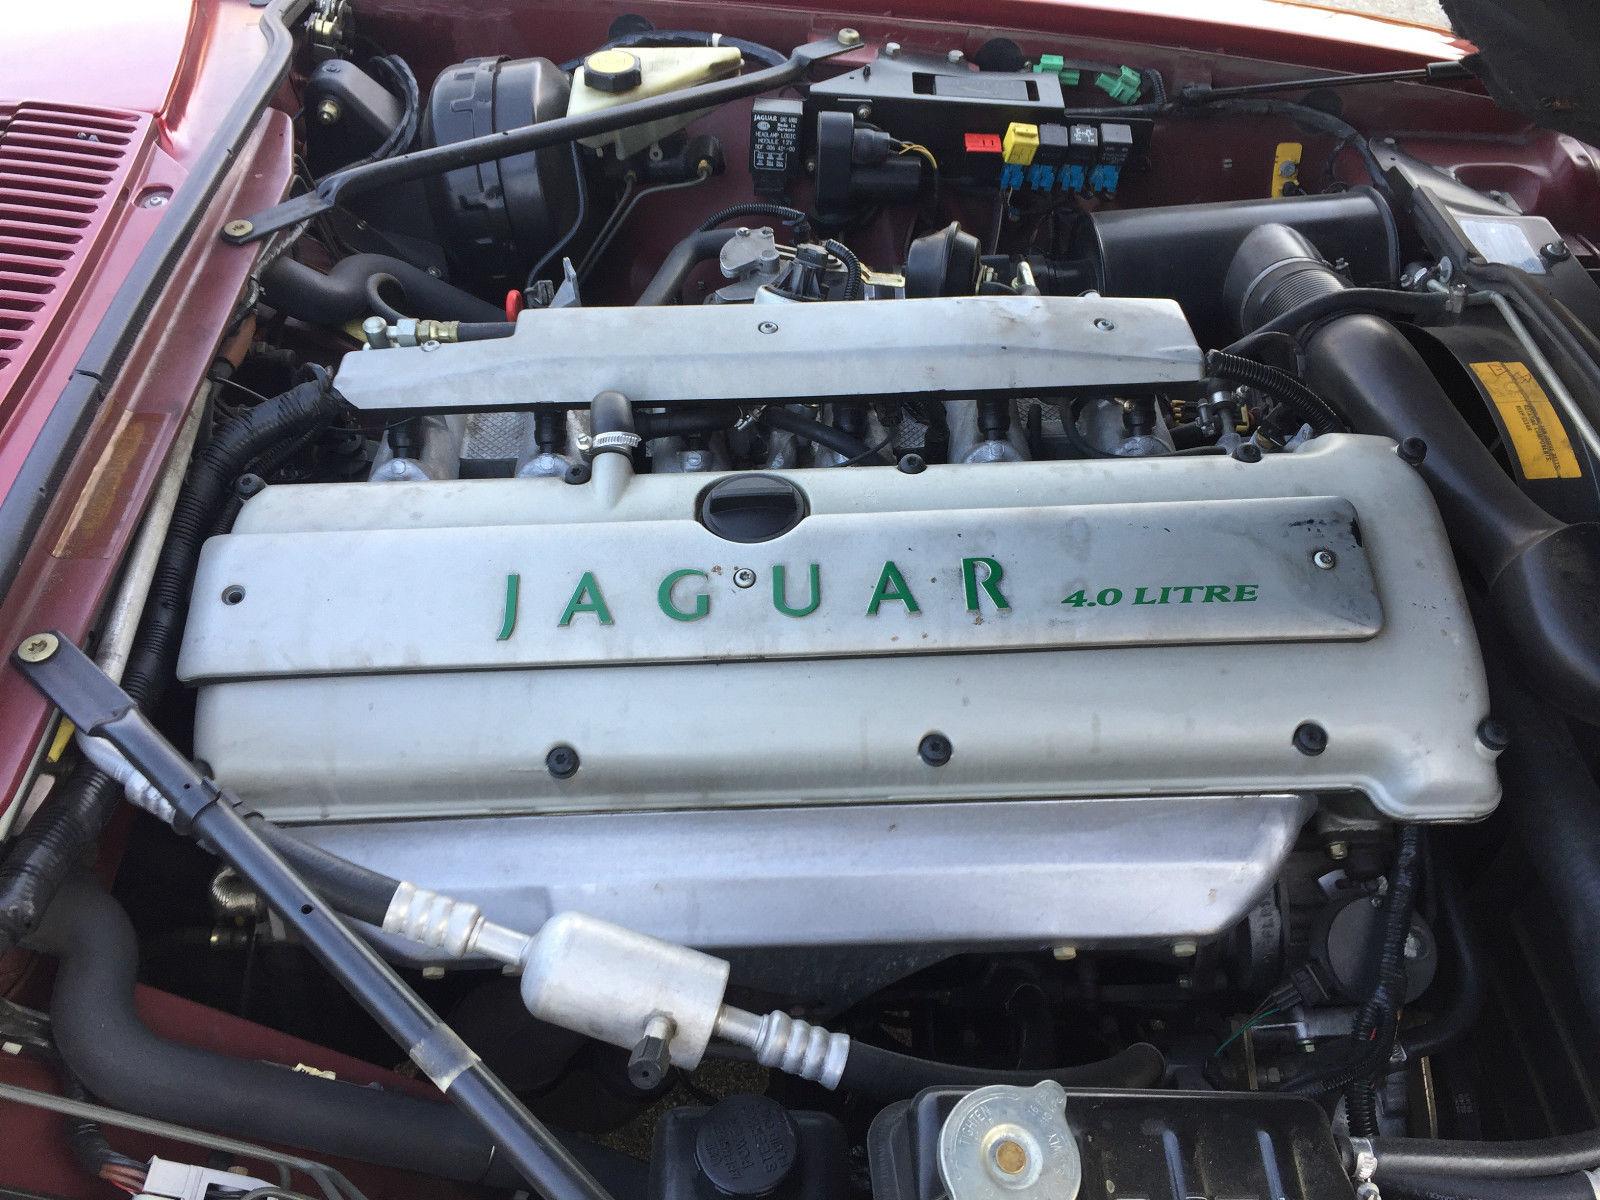 1996 Jaguar XJS Convertible engine